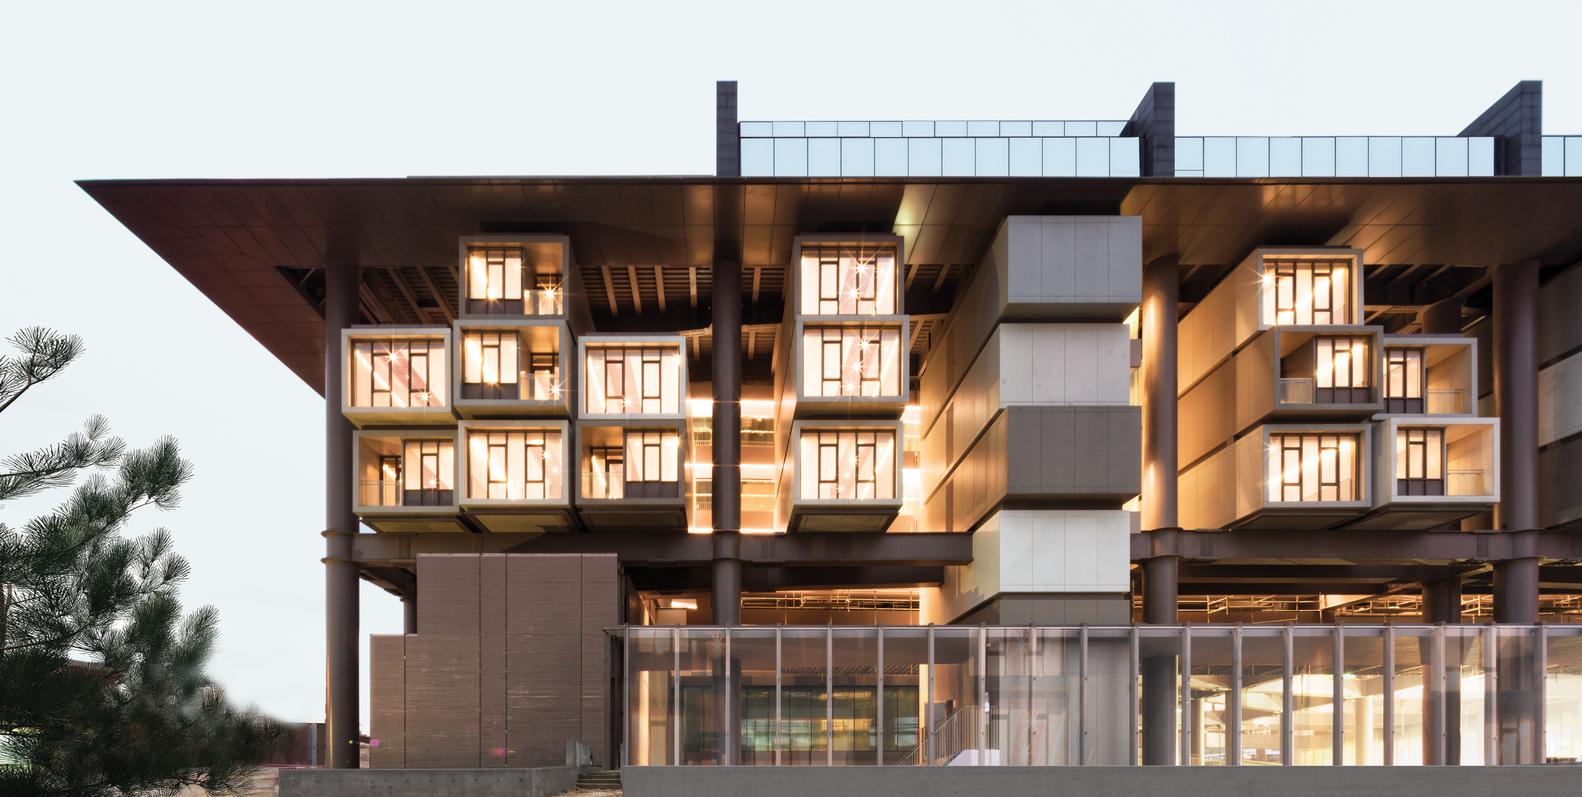 The Museum Hotel Antakya / EAA – Emre Arolat Architecture